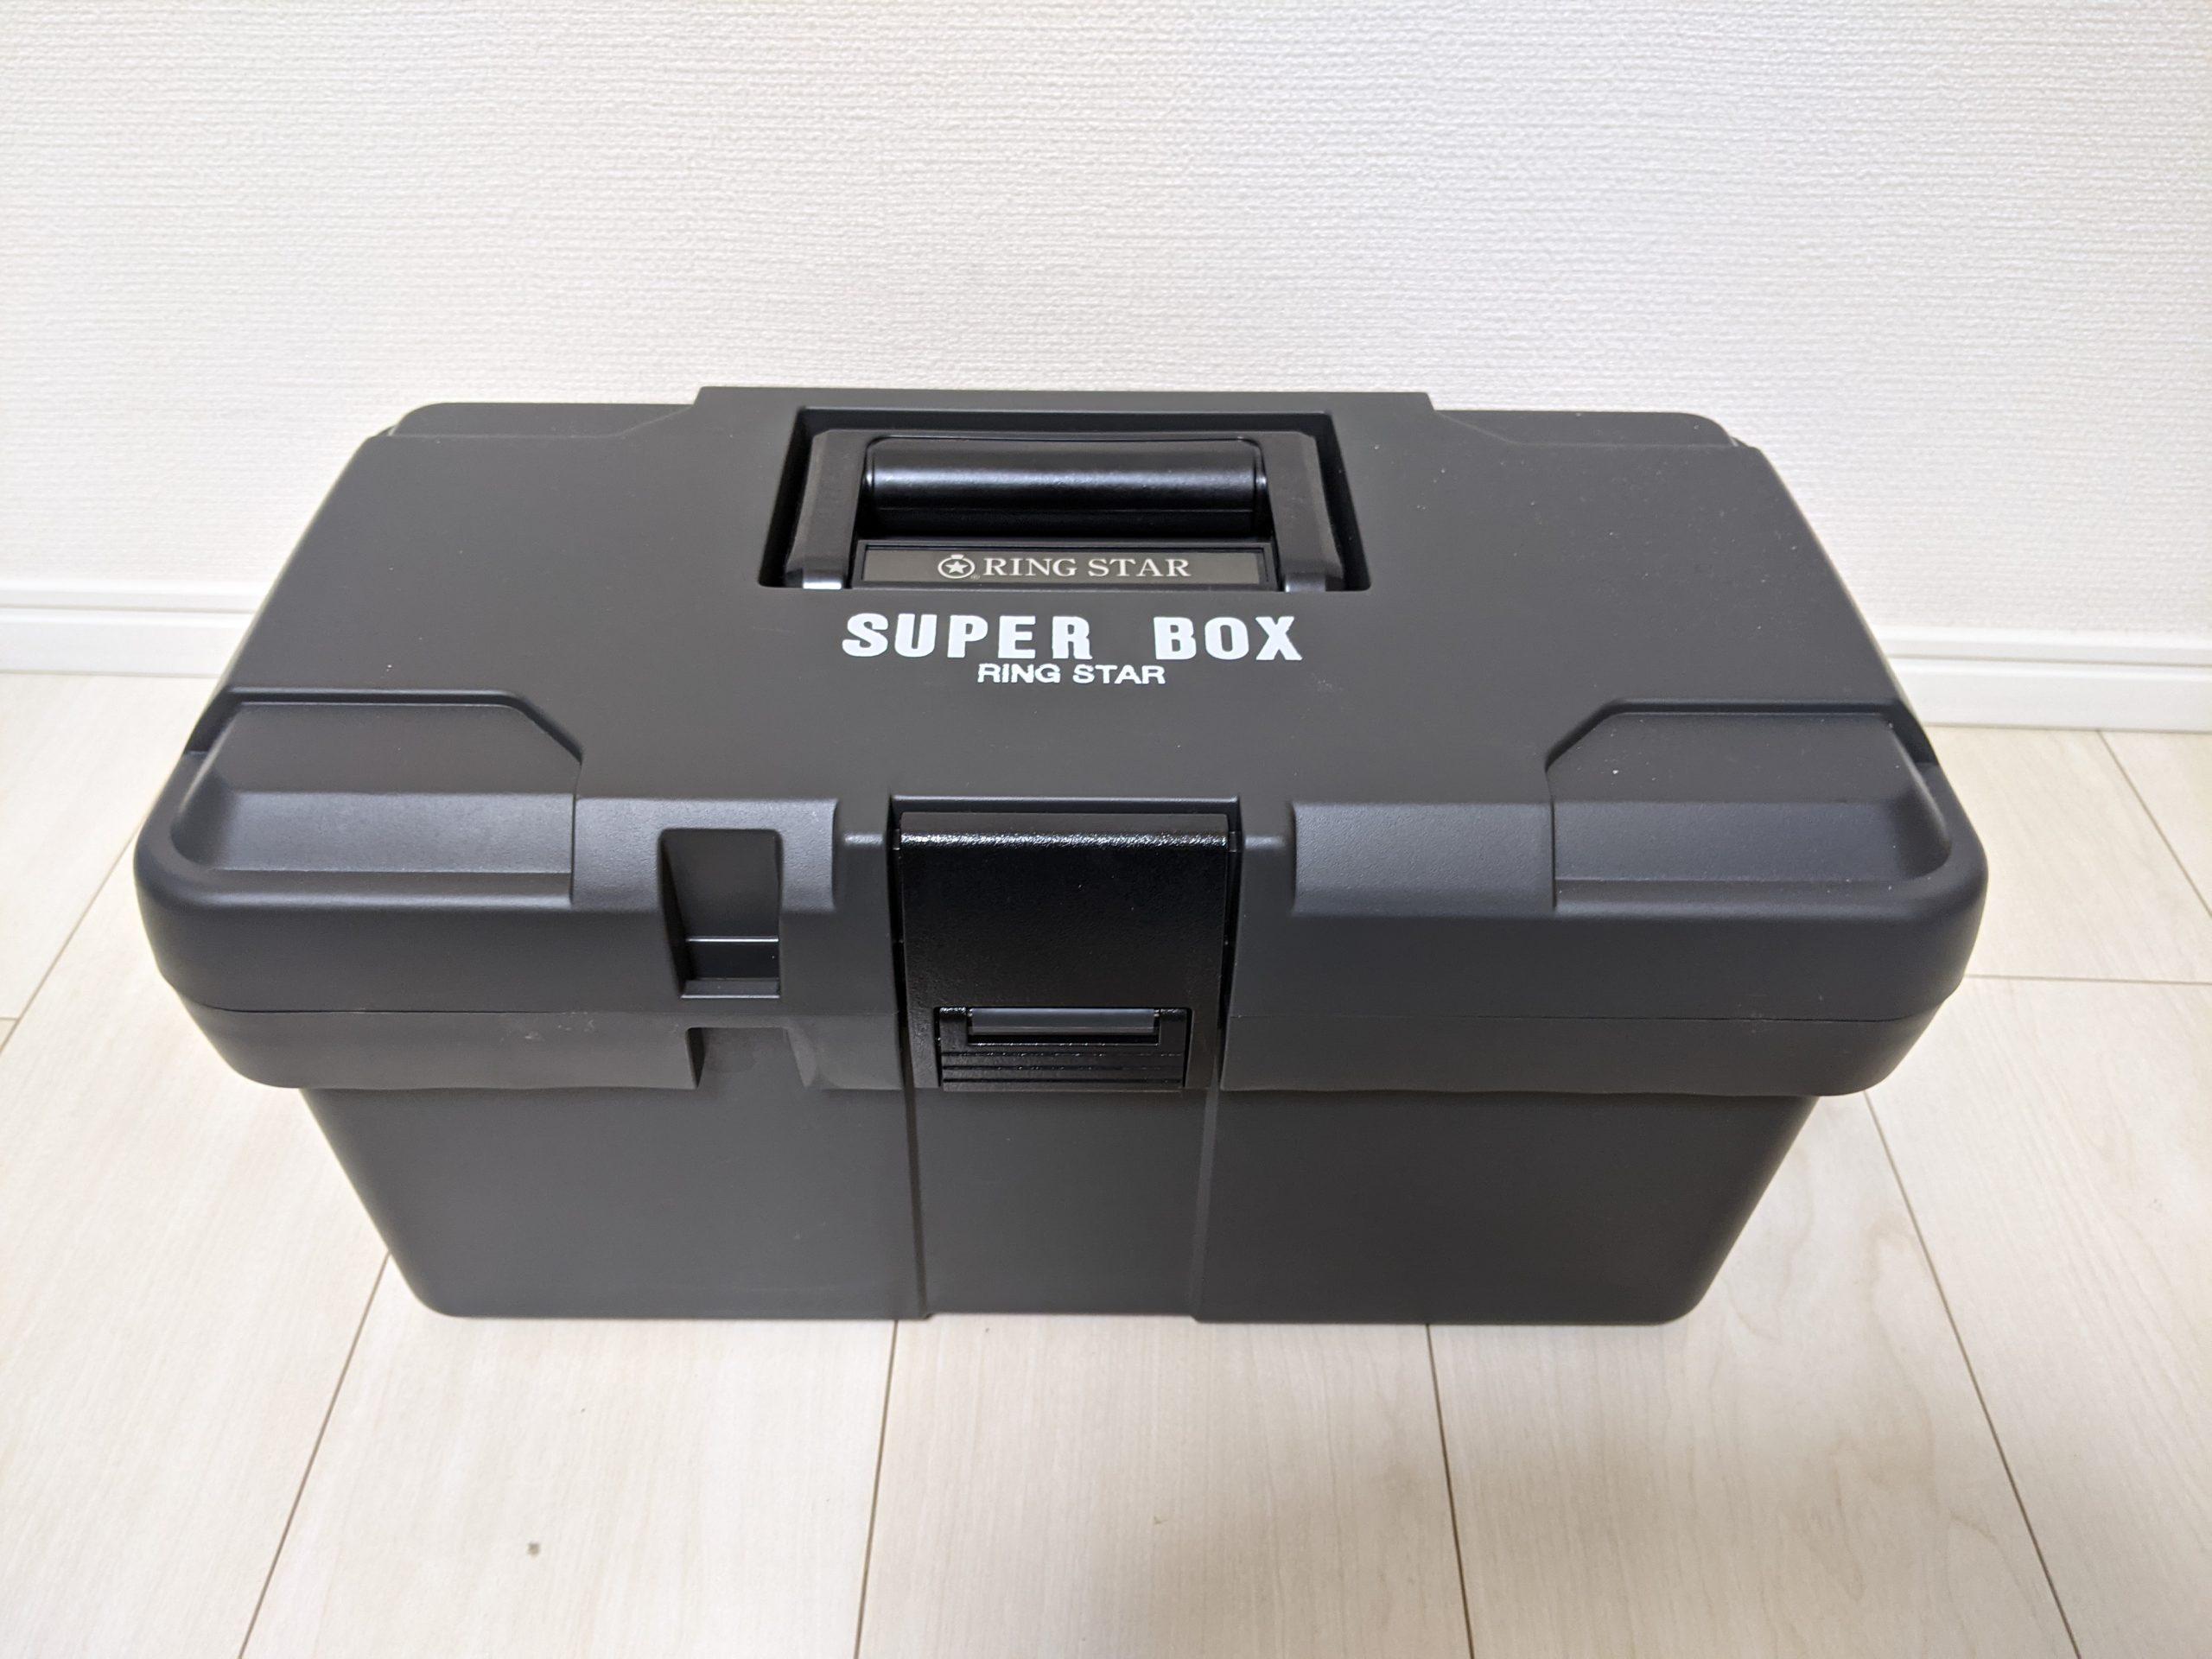 RING STAR SUPER BOX SR-400